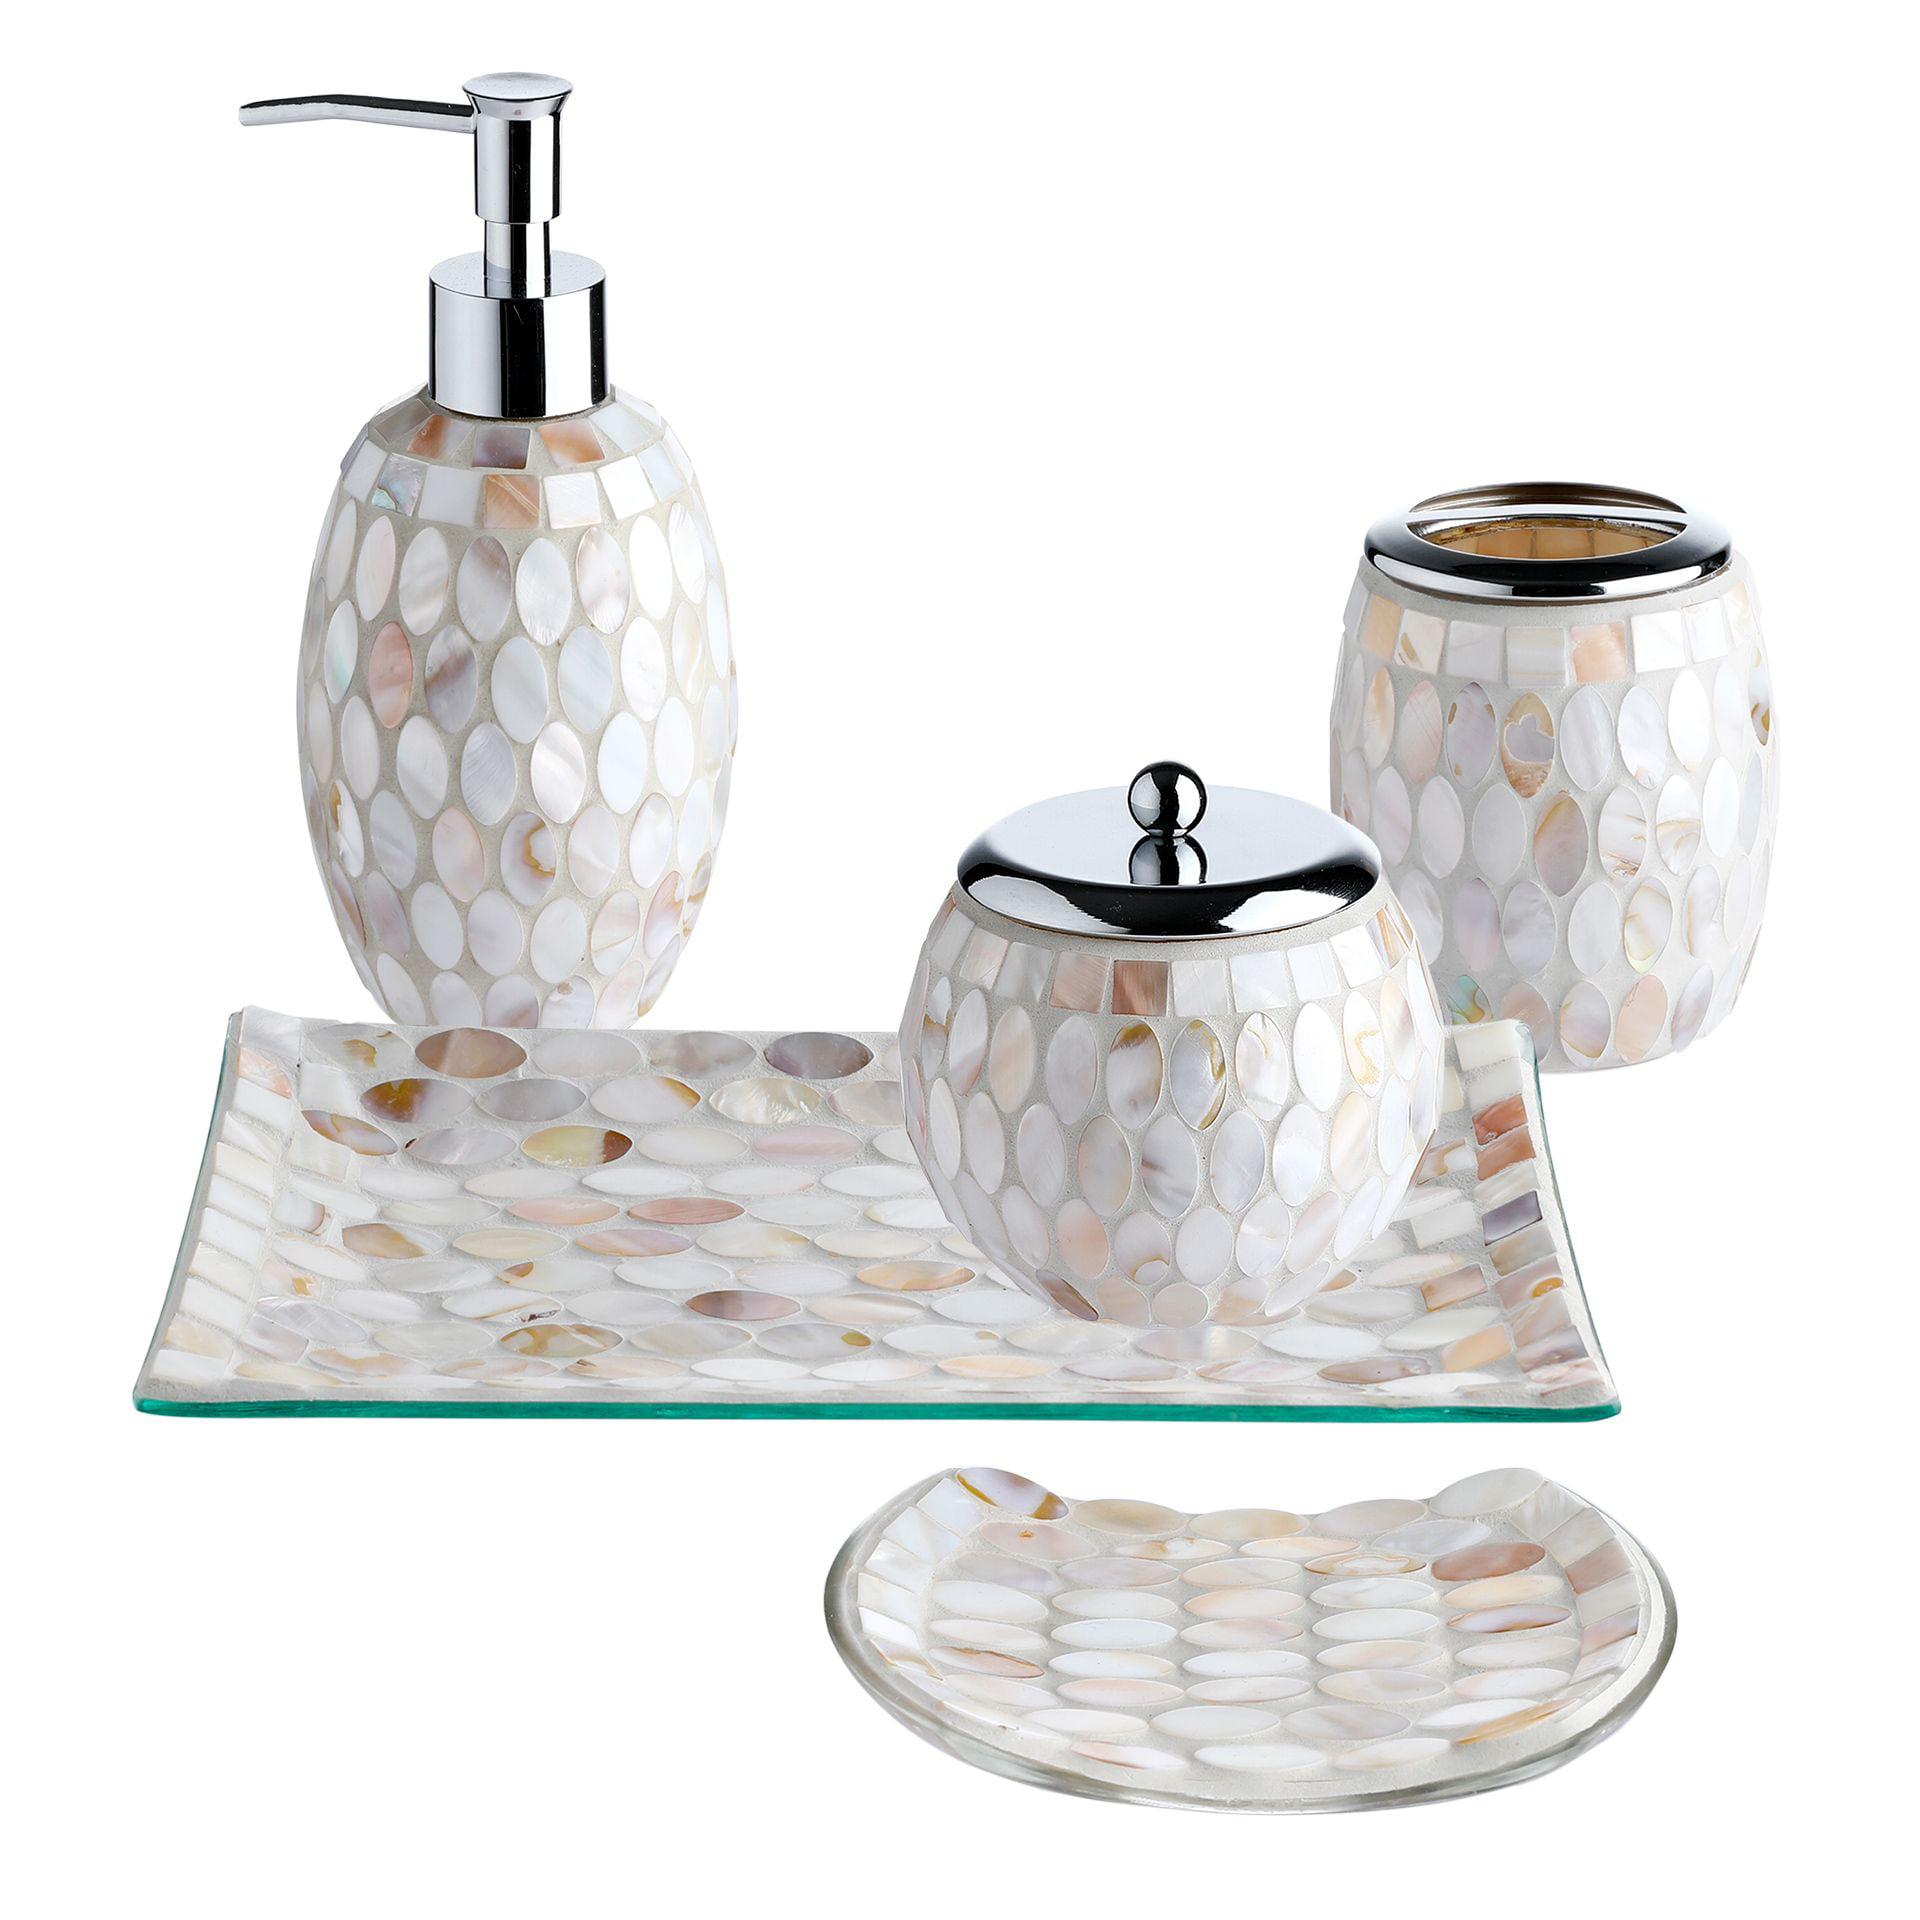 Cotton Jar Vanity Tray Soap Dish, Bathroom Soap Dispenser Set With Tray